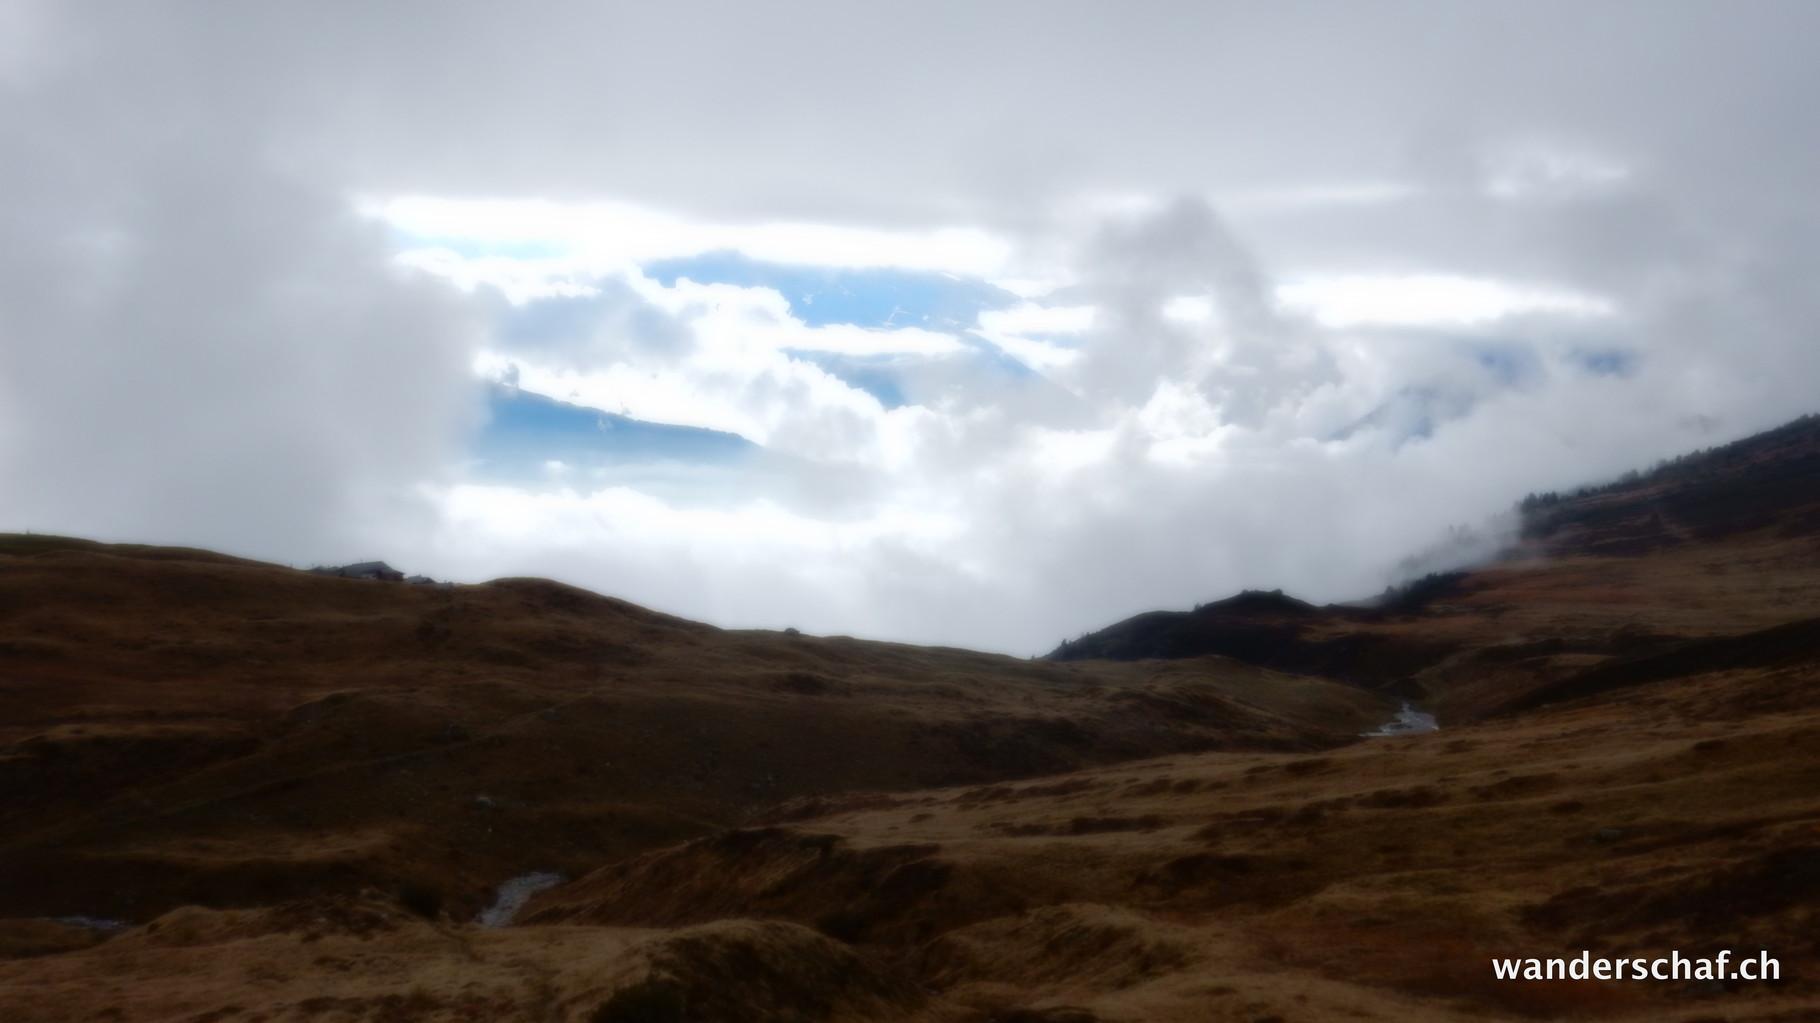 am Simplonpass drüben sieht das Wetter beser aus